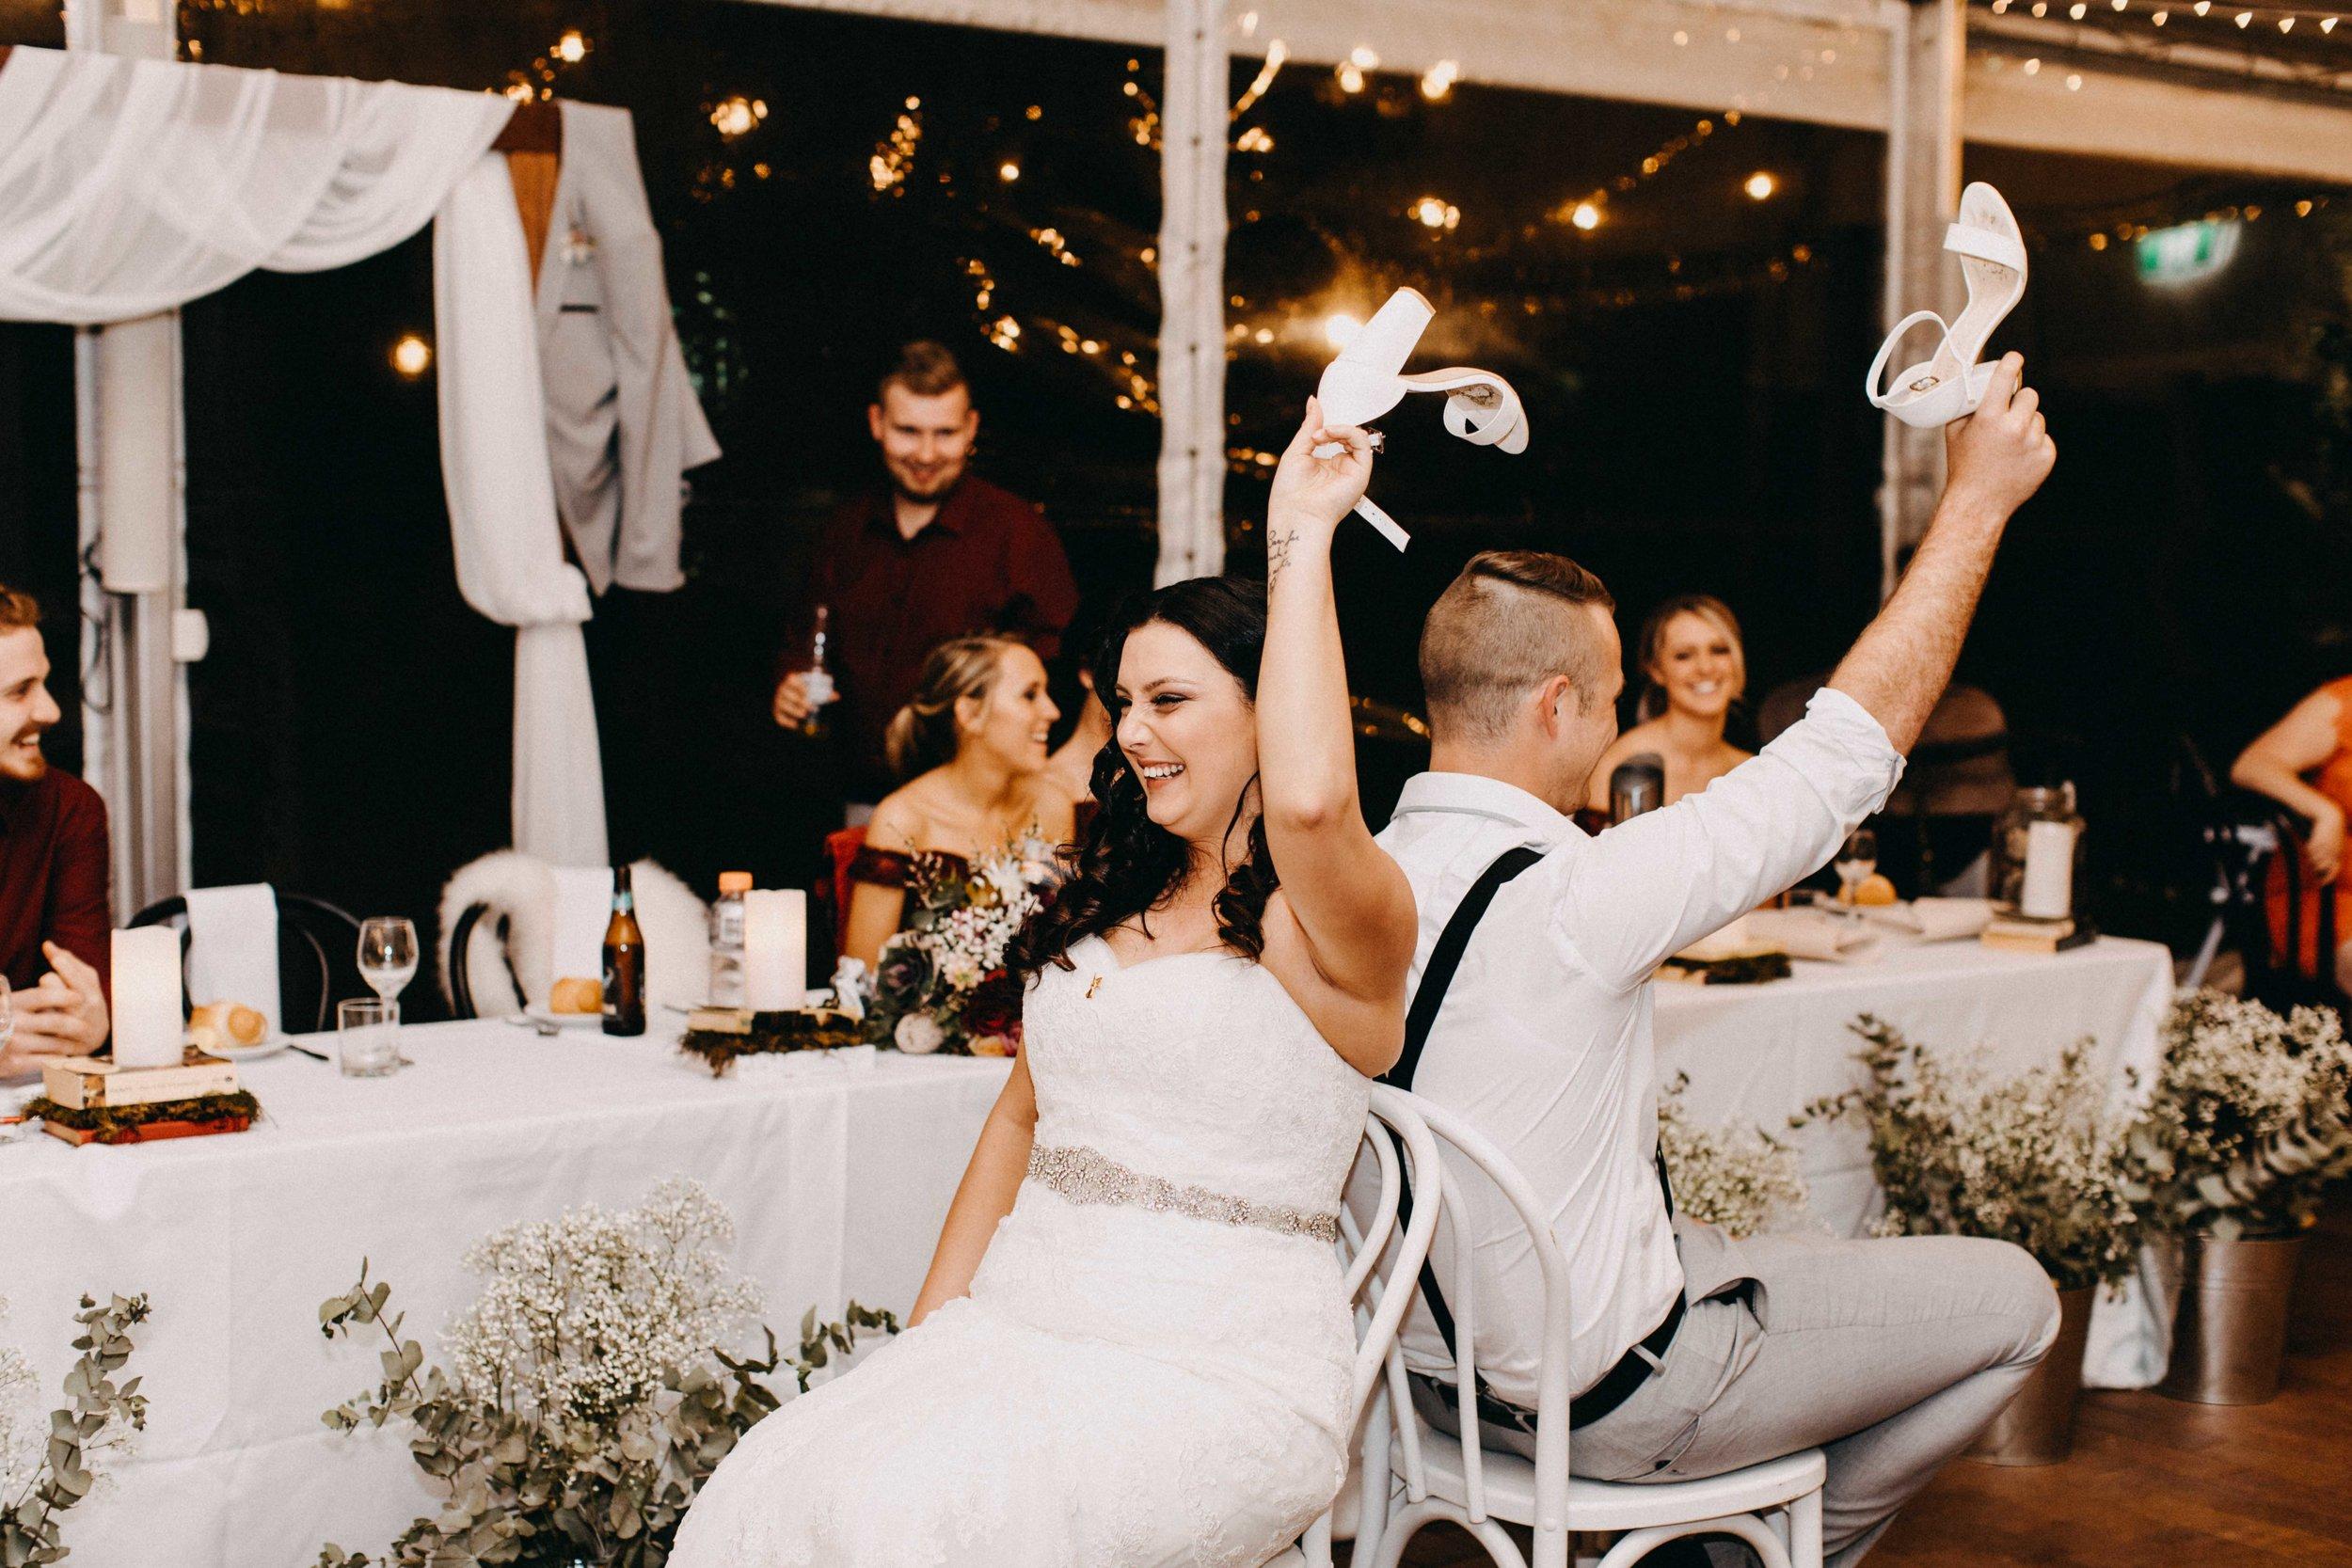 burnham-grove-camden-wedding-emilyobrienphotography-macarthur-151.jpg